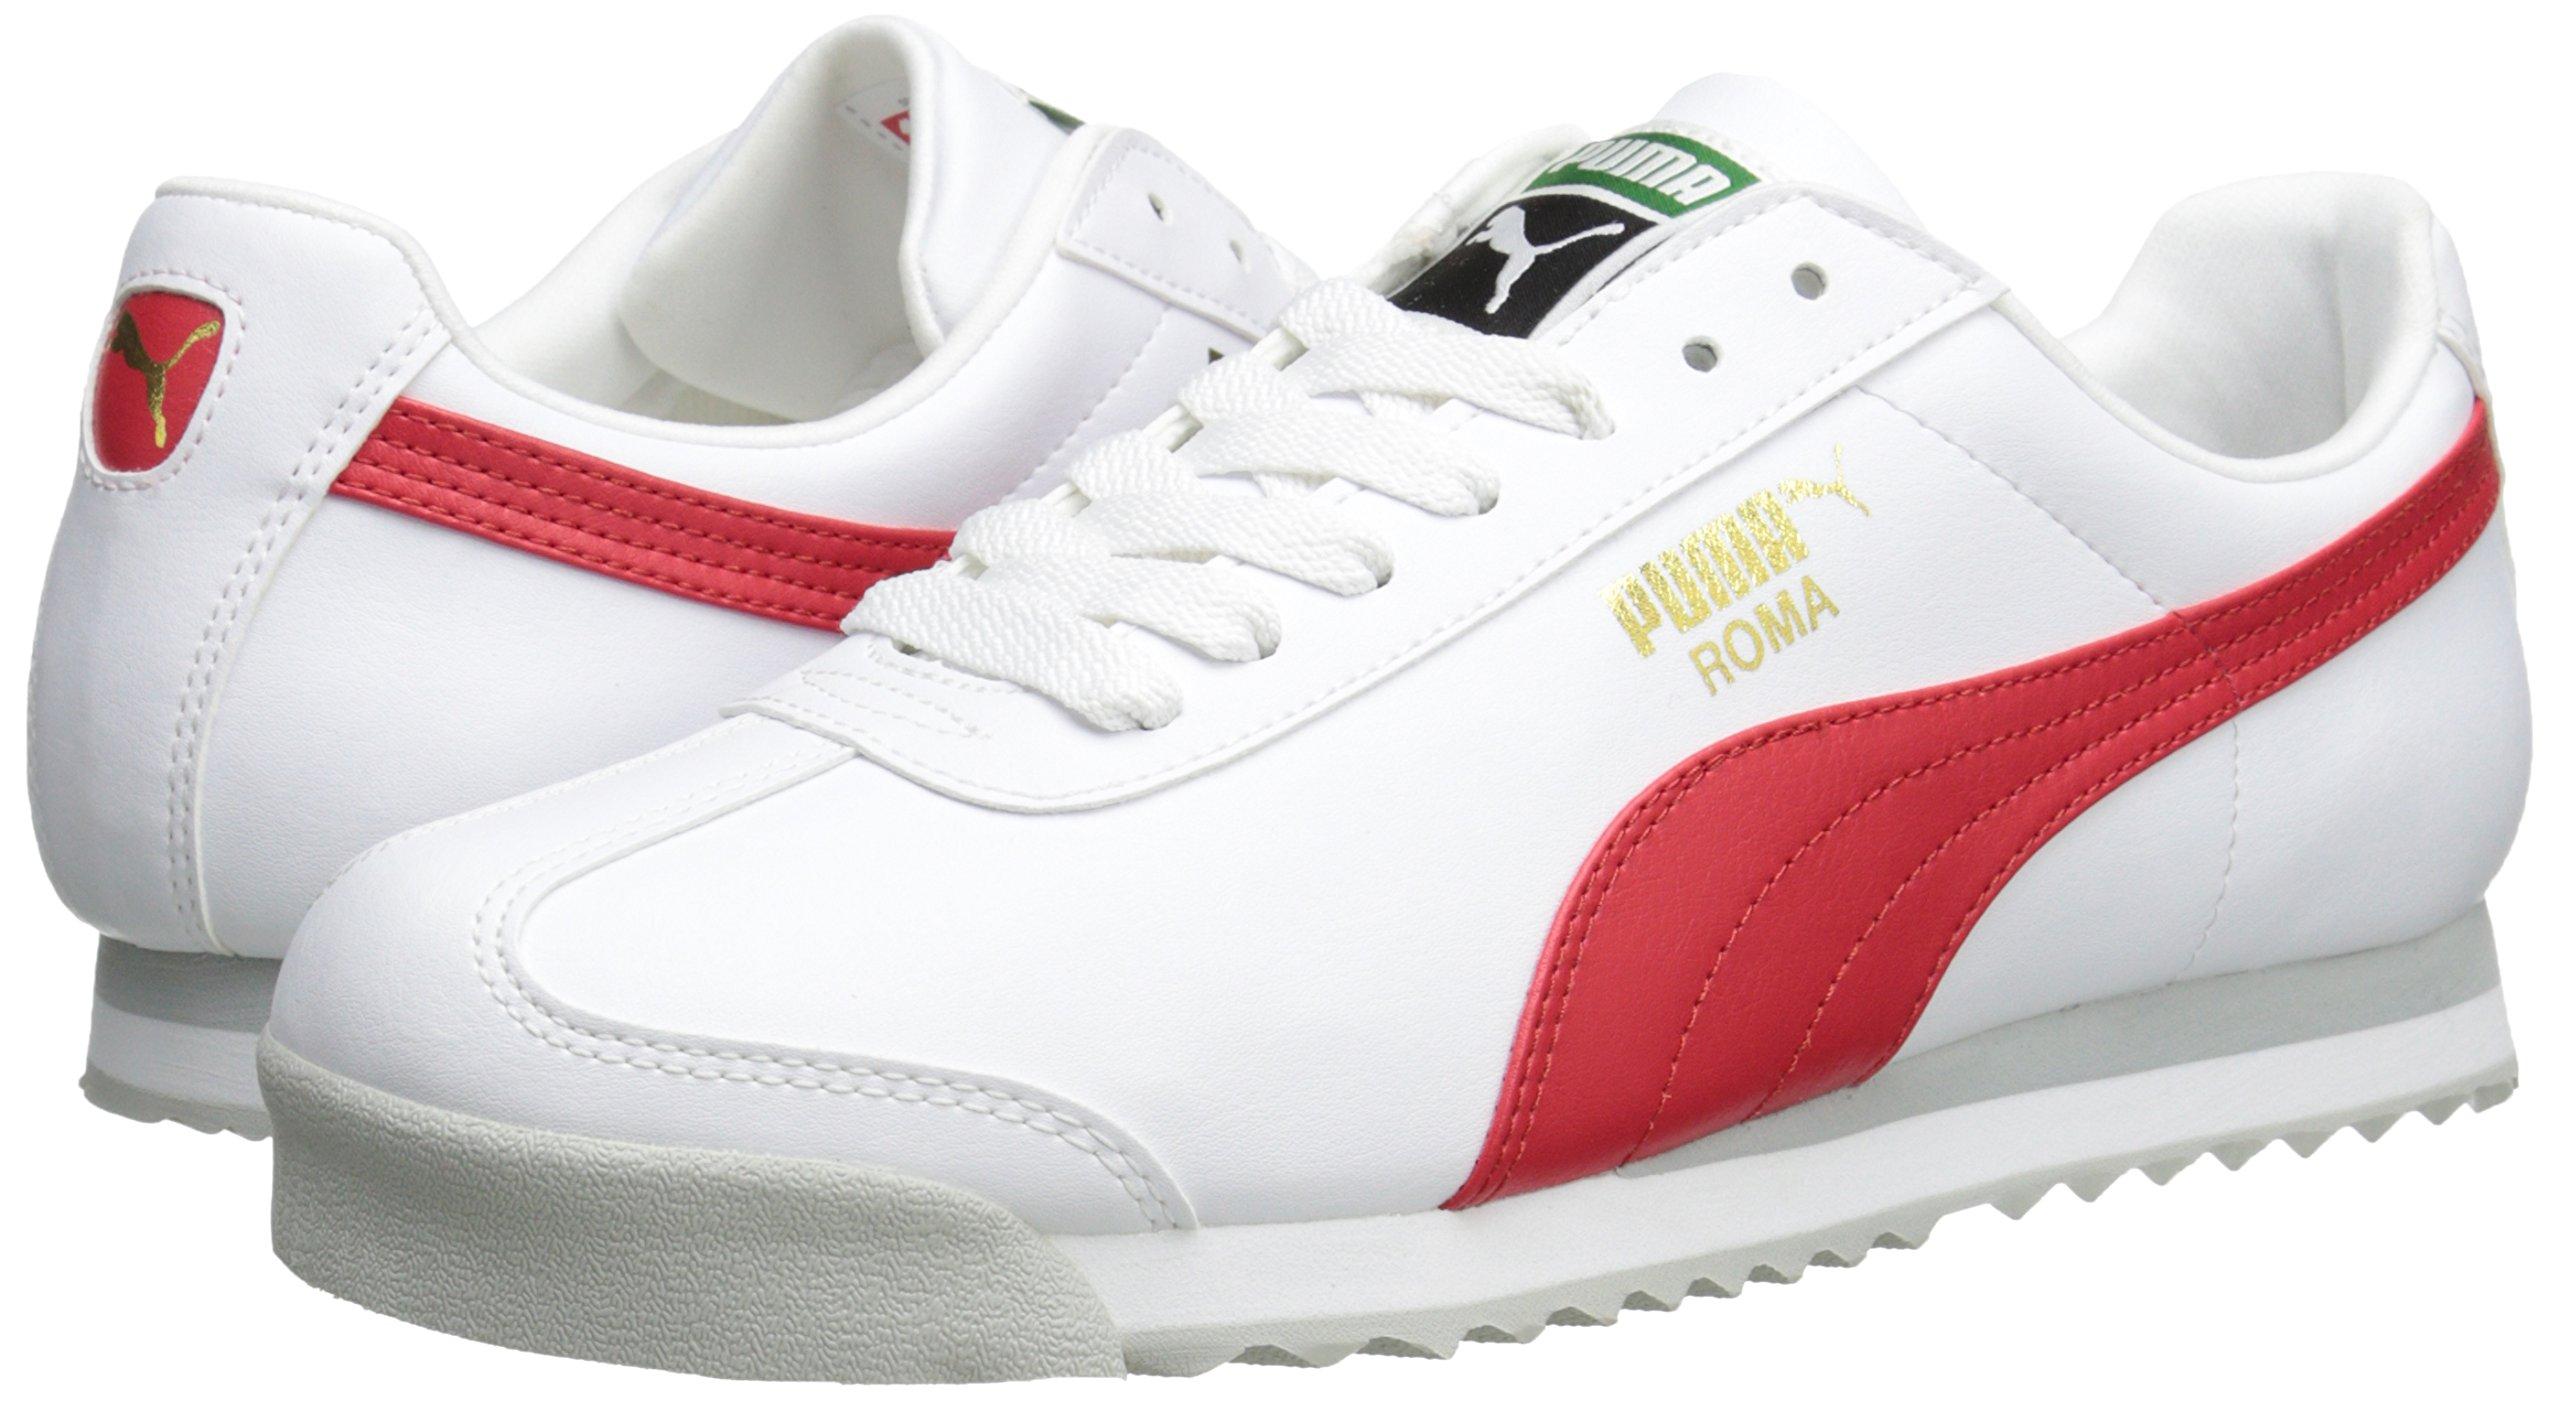 PUMA Men's Roma Basic Fashion Sneaker, White/High Risk Red/White - 9 D(M) US by PUMA (Image #6)